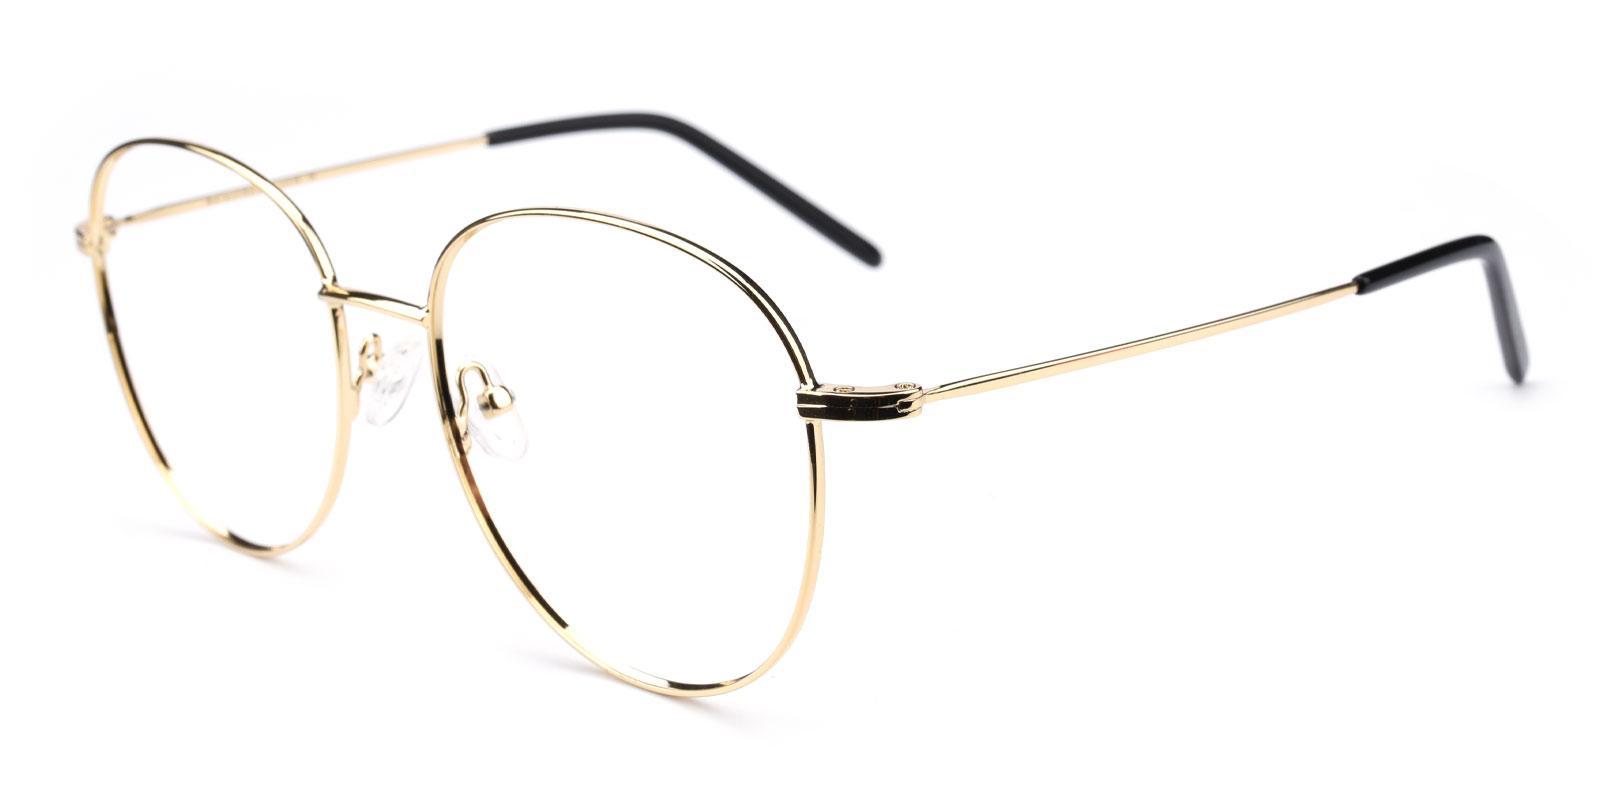 Enid-Gold-Round / Square-Metal / TR-Eyeglasses-detail